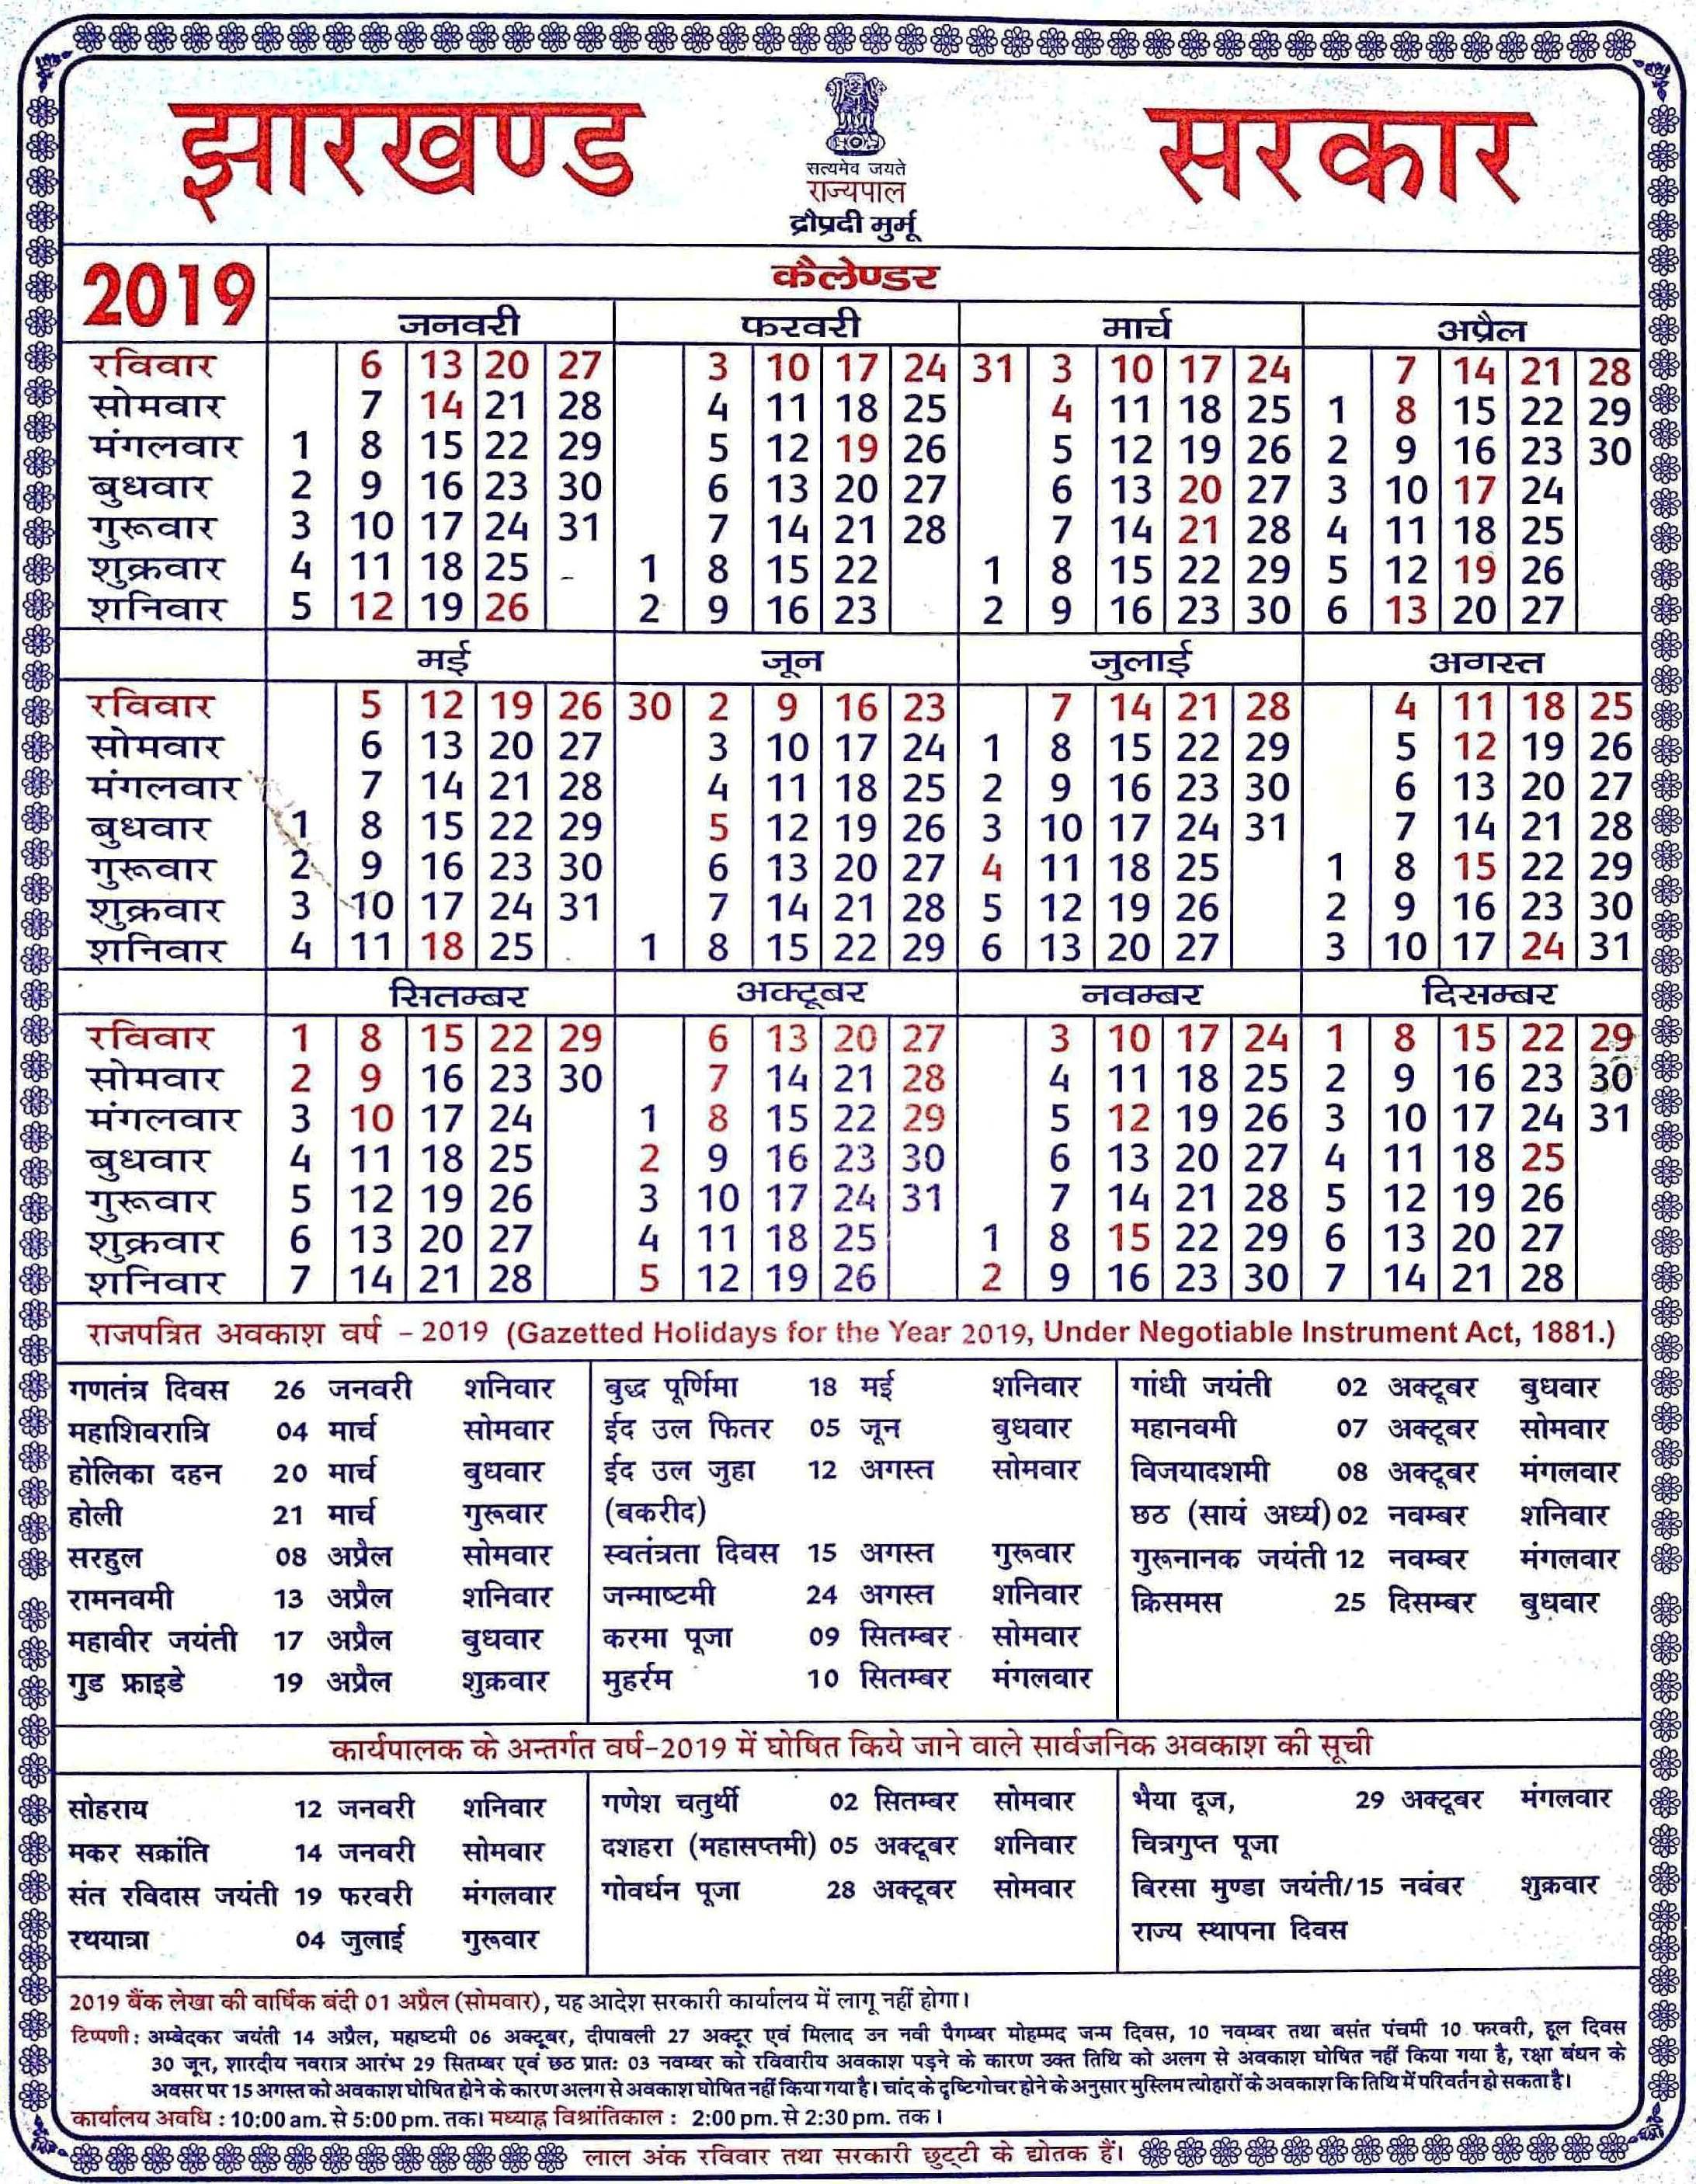 District Giridih, Government Of Jharkhand | City Of Hills regarding Download Bihar Sarkar Calendar 2020